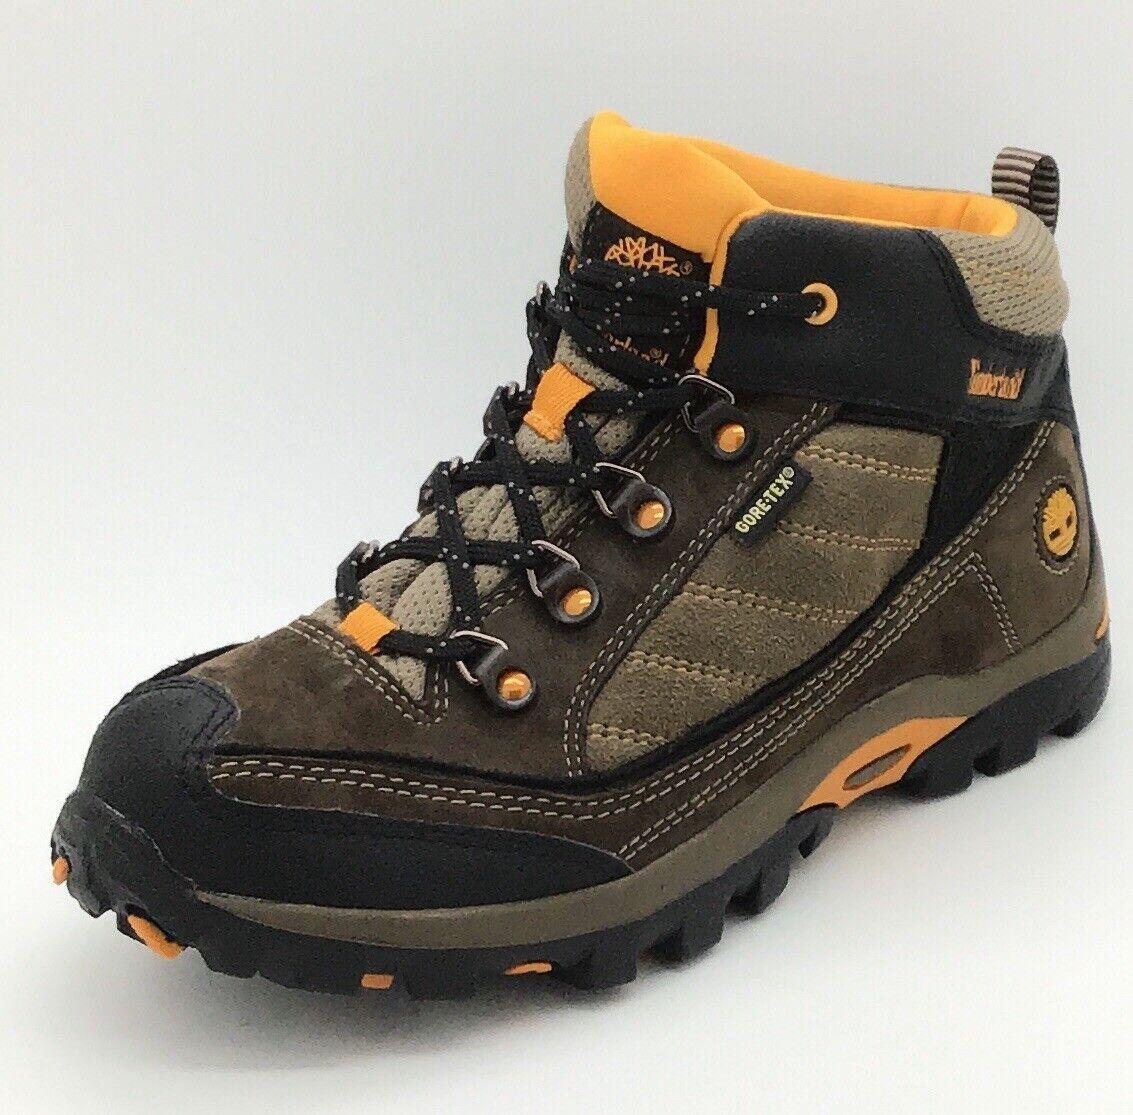 Timberland Junior Boys Hyprtrl GTX Mid Brown Trainer Boots UK 4.5 - 37918**